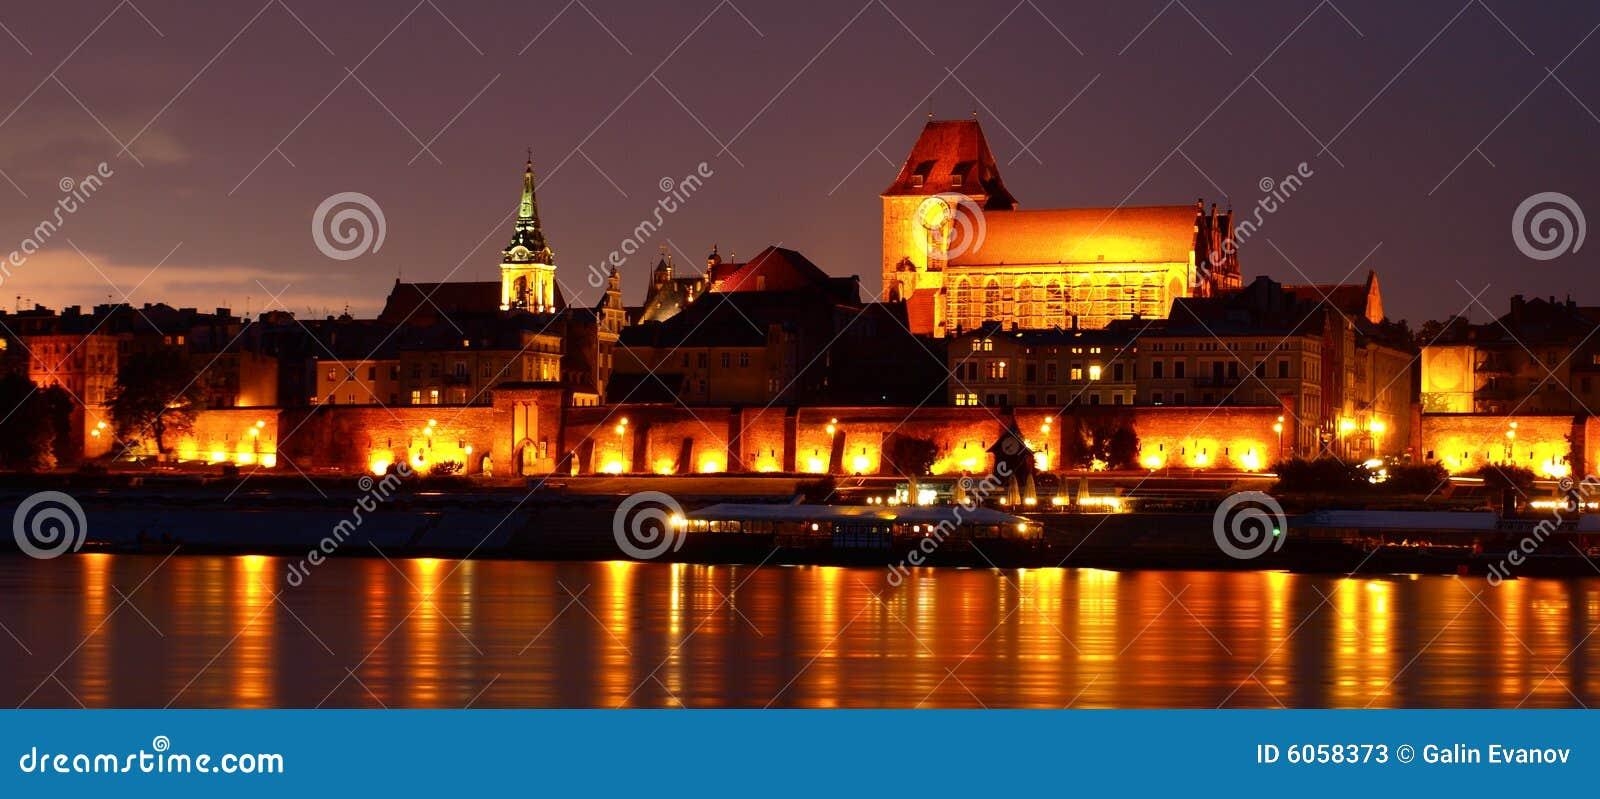 Old town of Torun at night